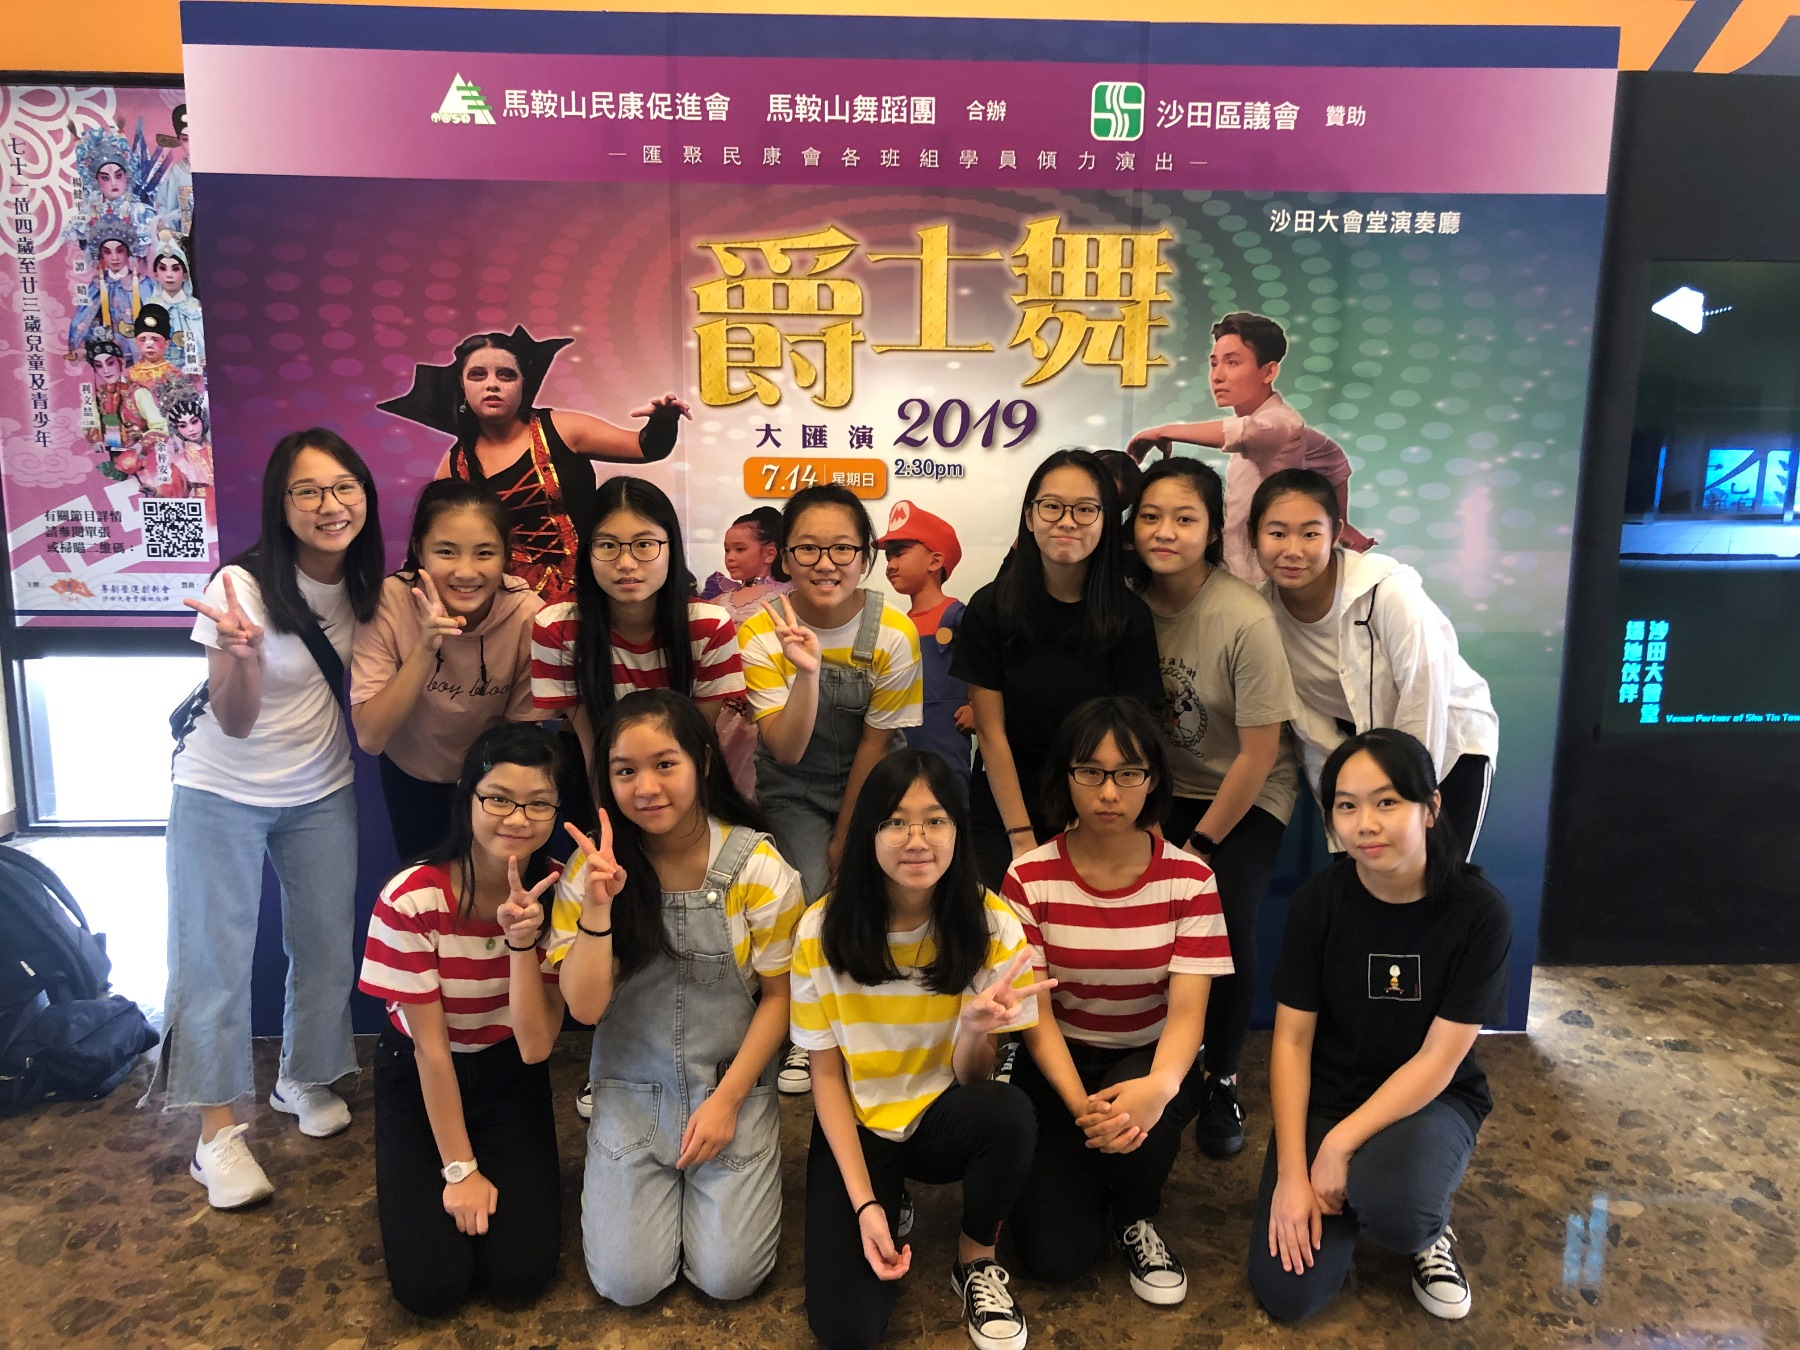 http://npc.edu.hk/sites/default/files/img_5250.jpg